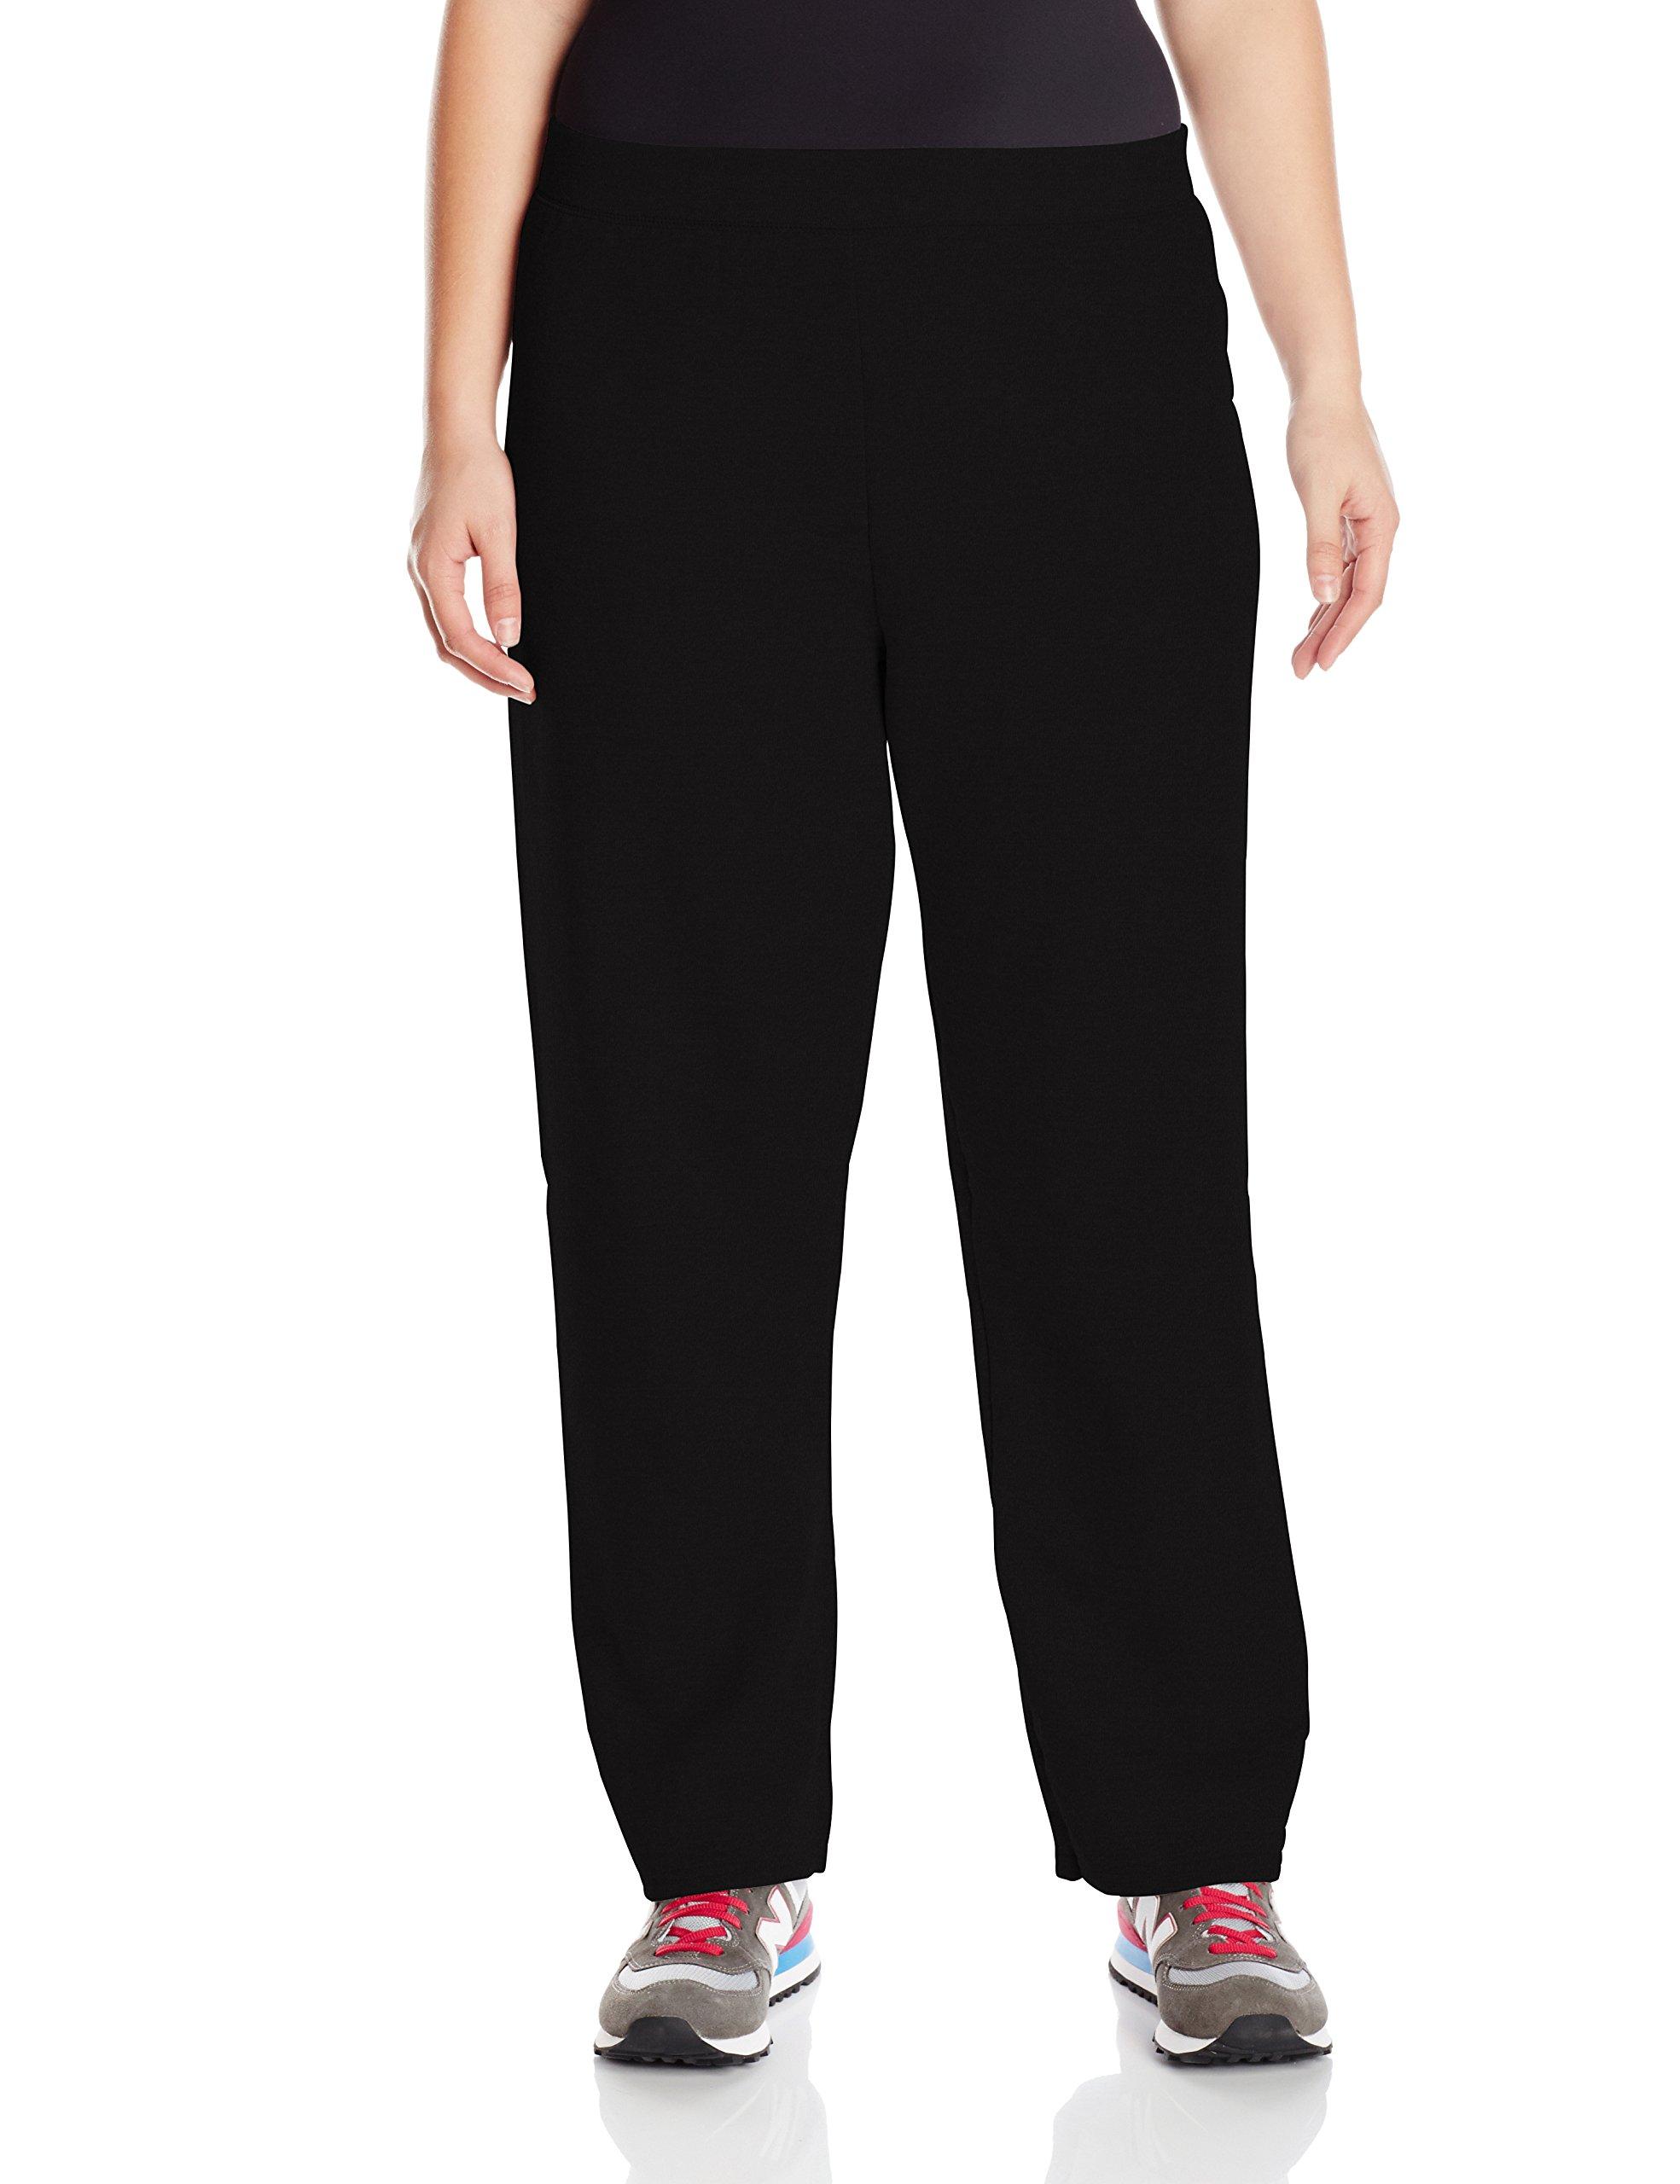 Just My Size Women's Plus-Size Fleece Sweatpant, Ebony, 2XL